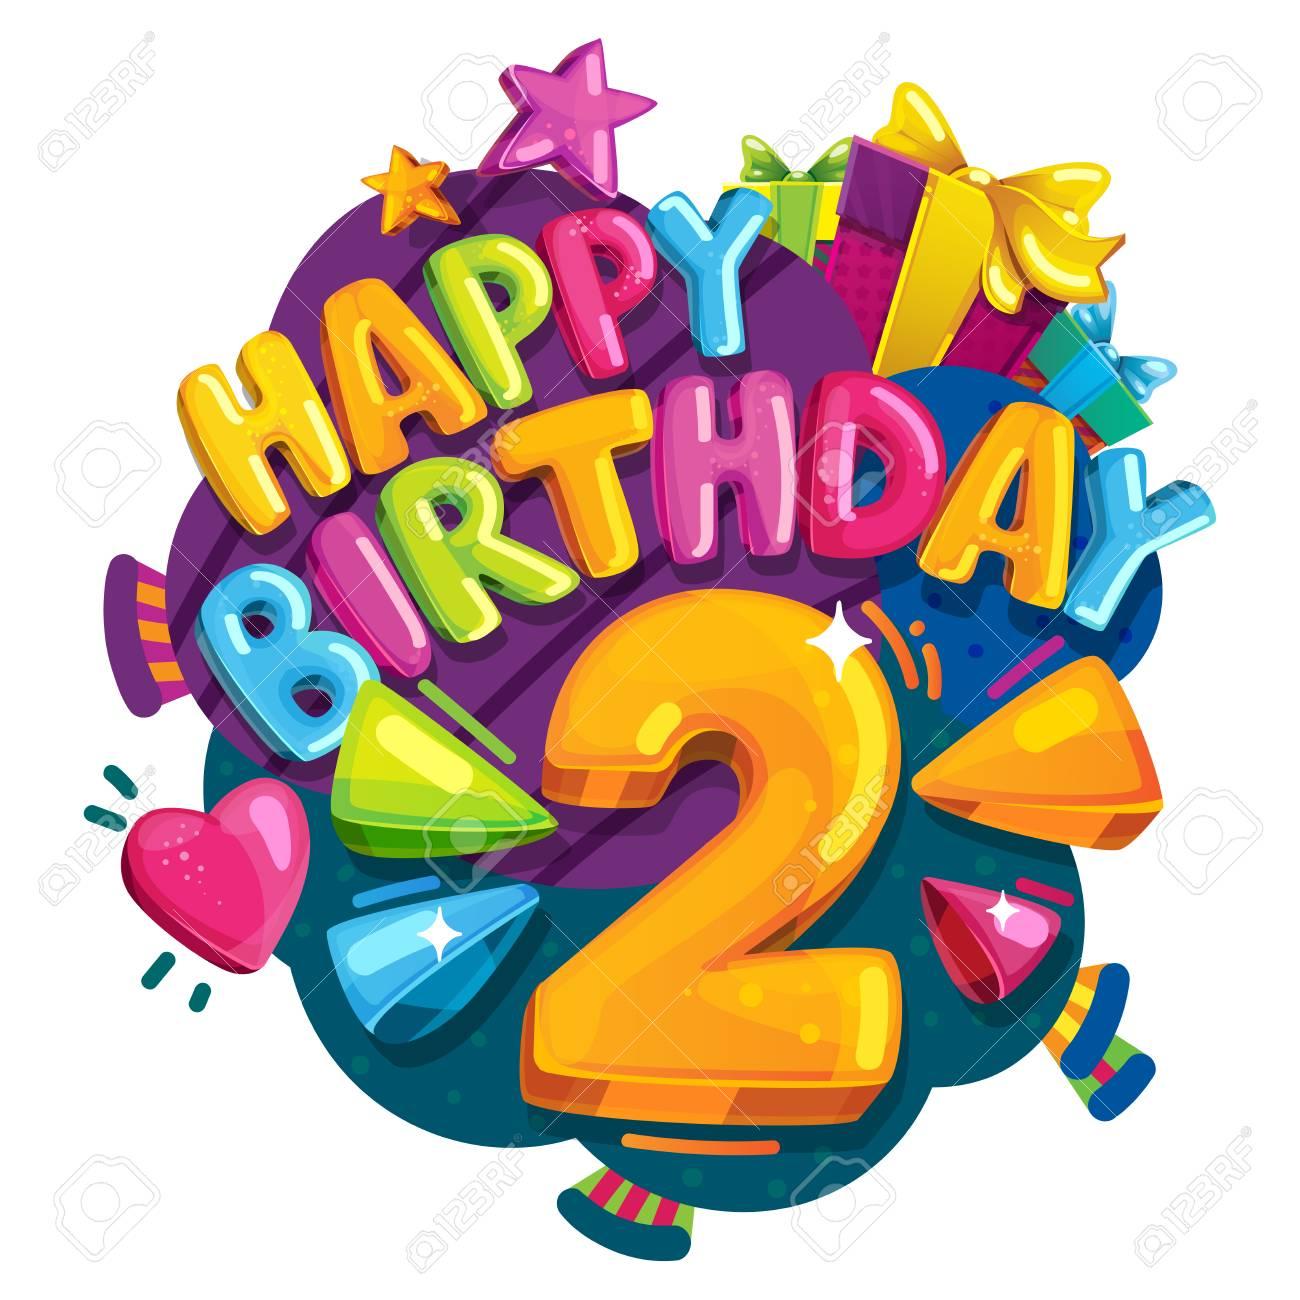 Happy Birthday 2 Years Colorful Festive Illustration For Celebratory